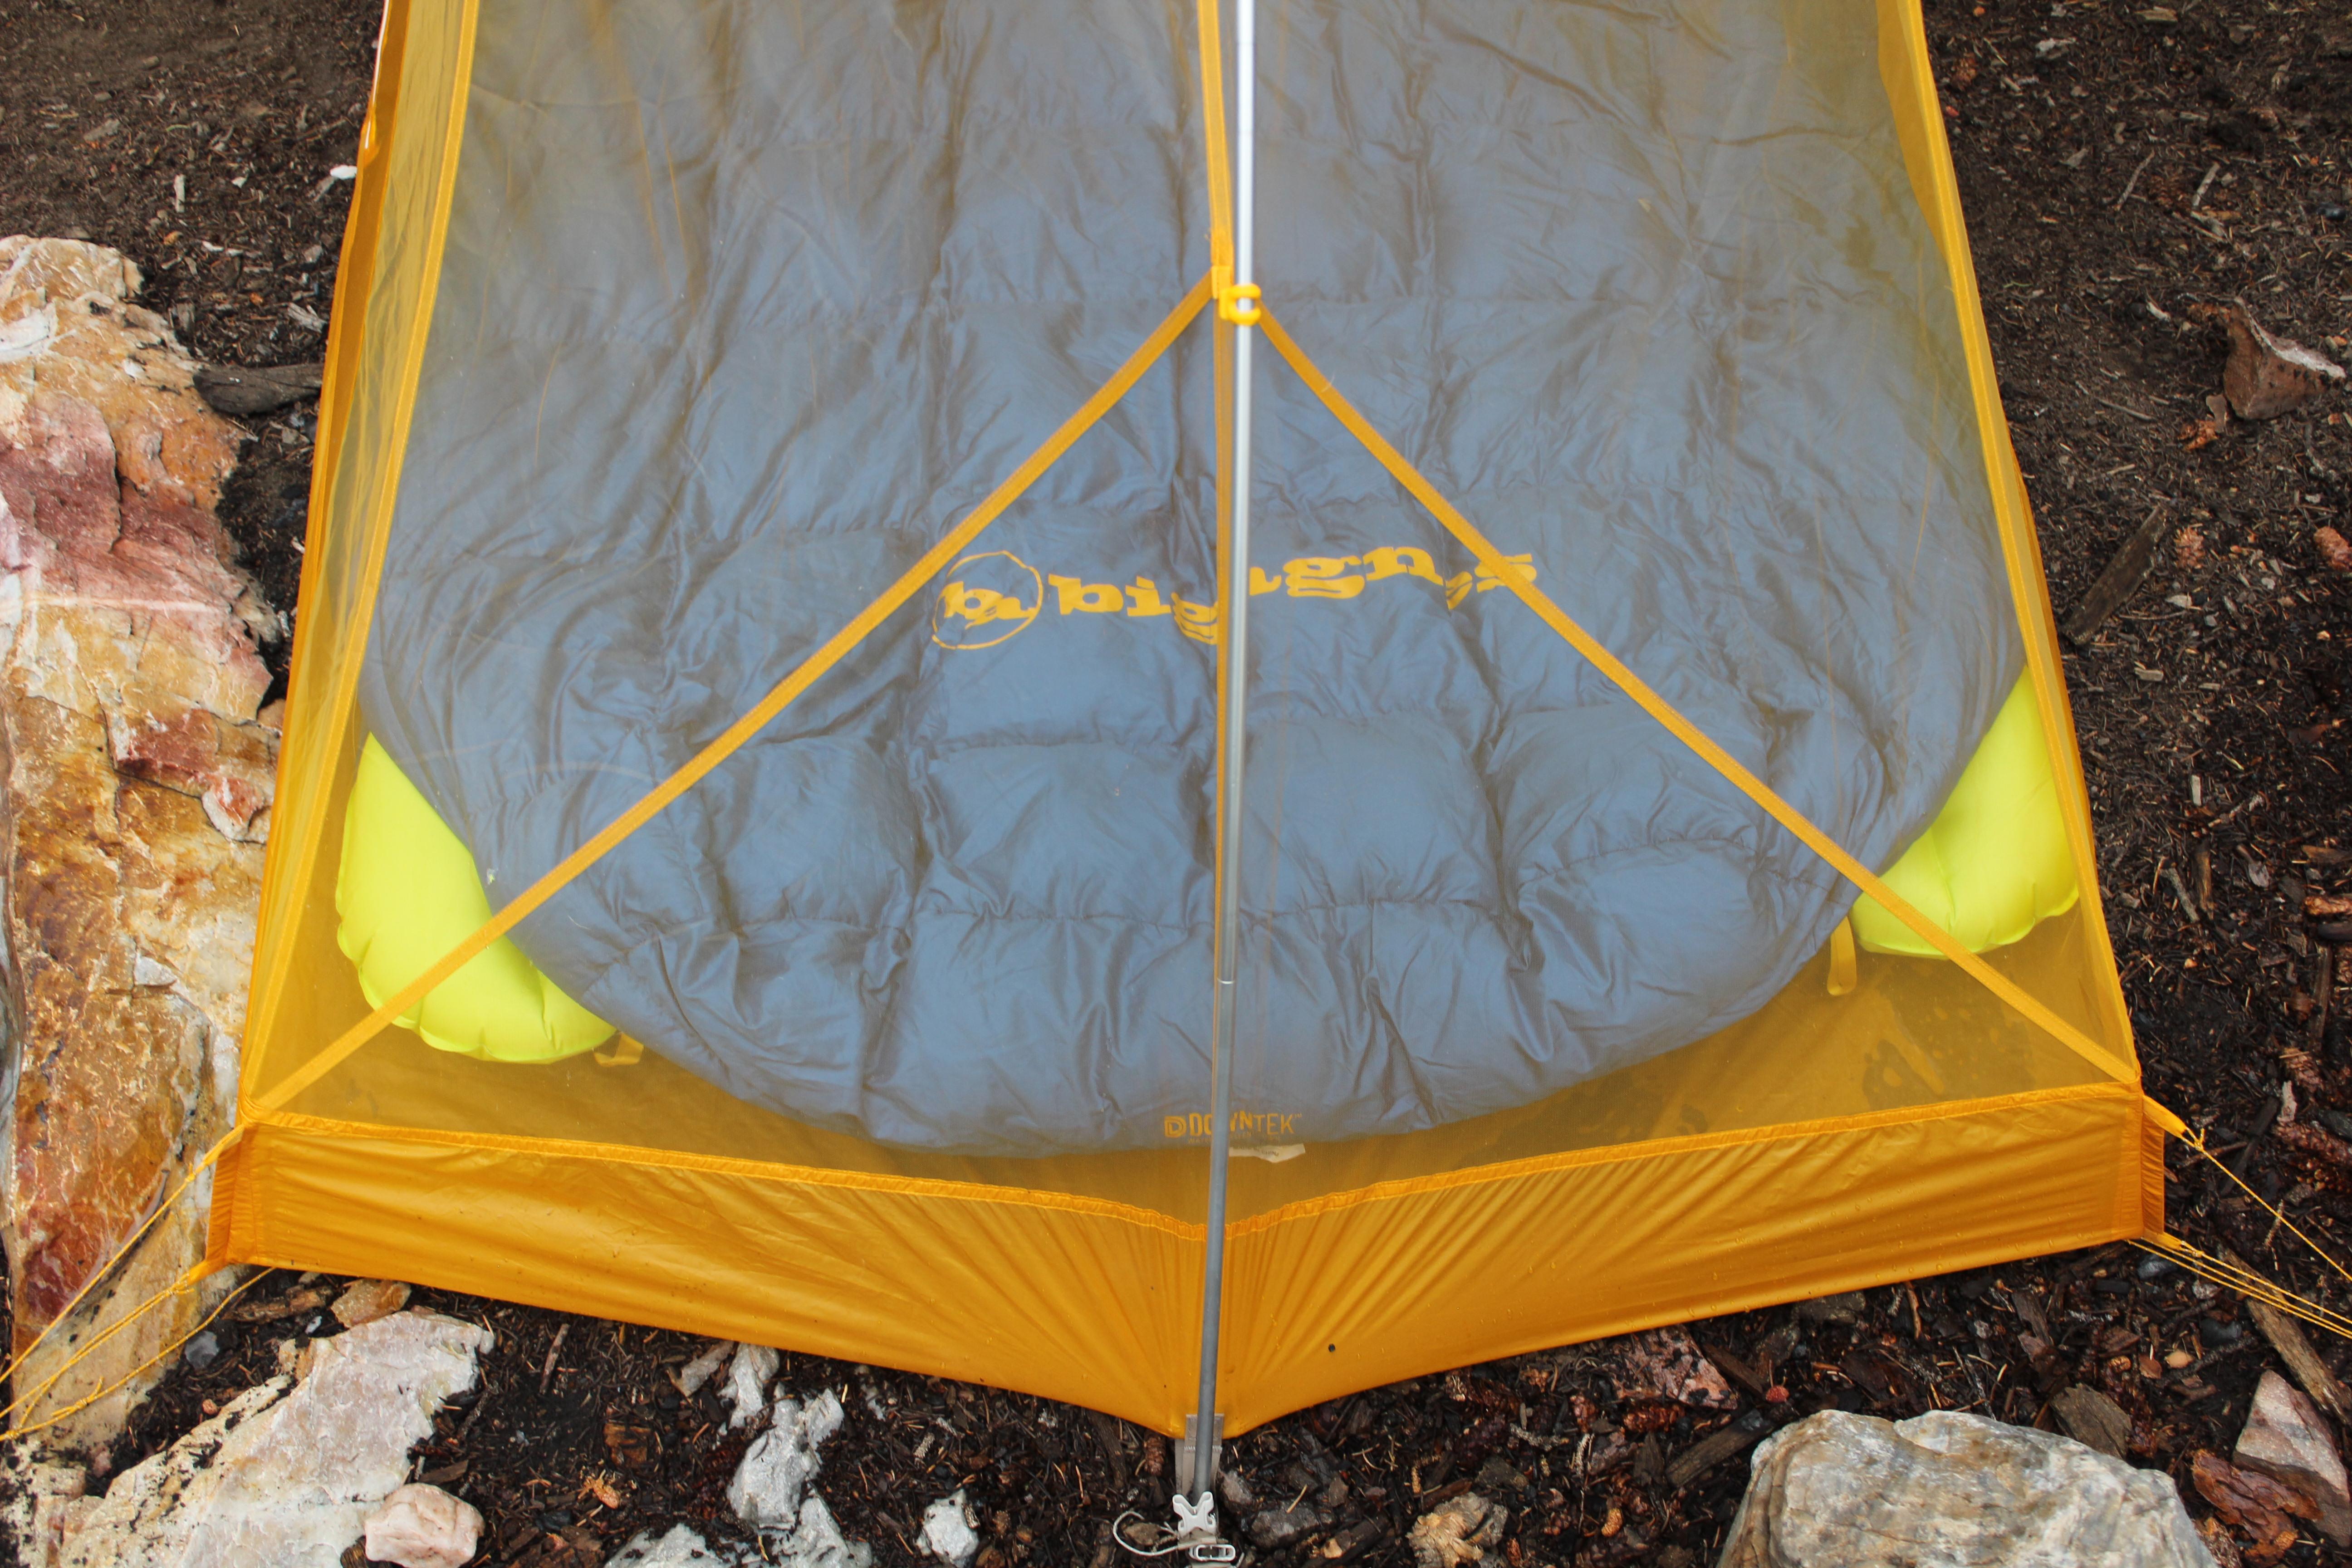 Big Agnes Tiger Wall UL2 Review: Ultralight 2-Person Tent | GearJunkie